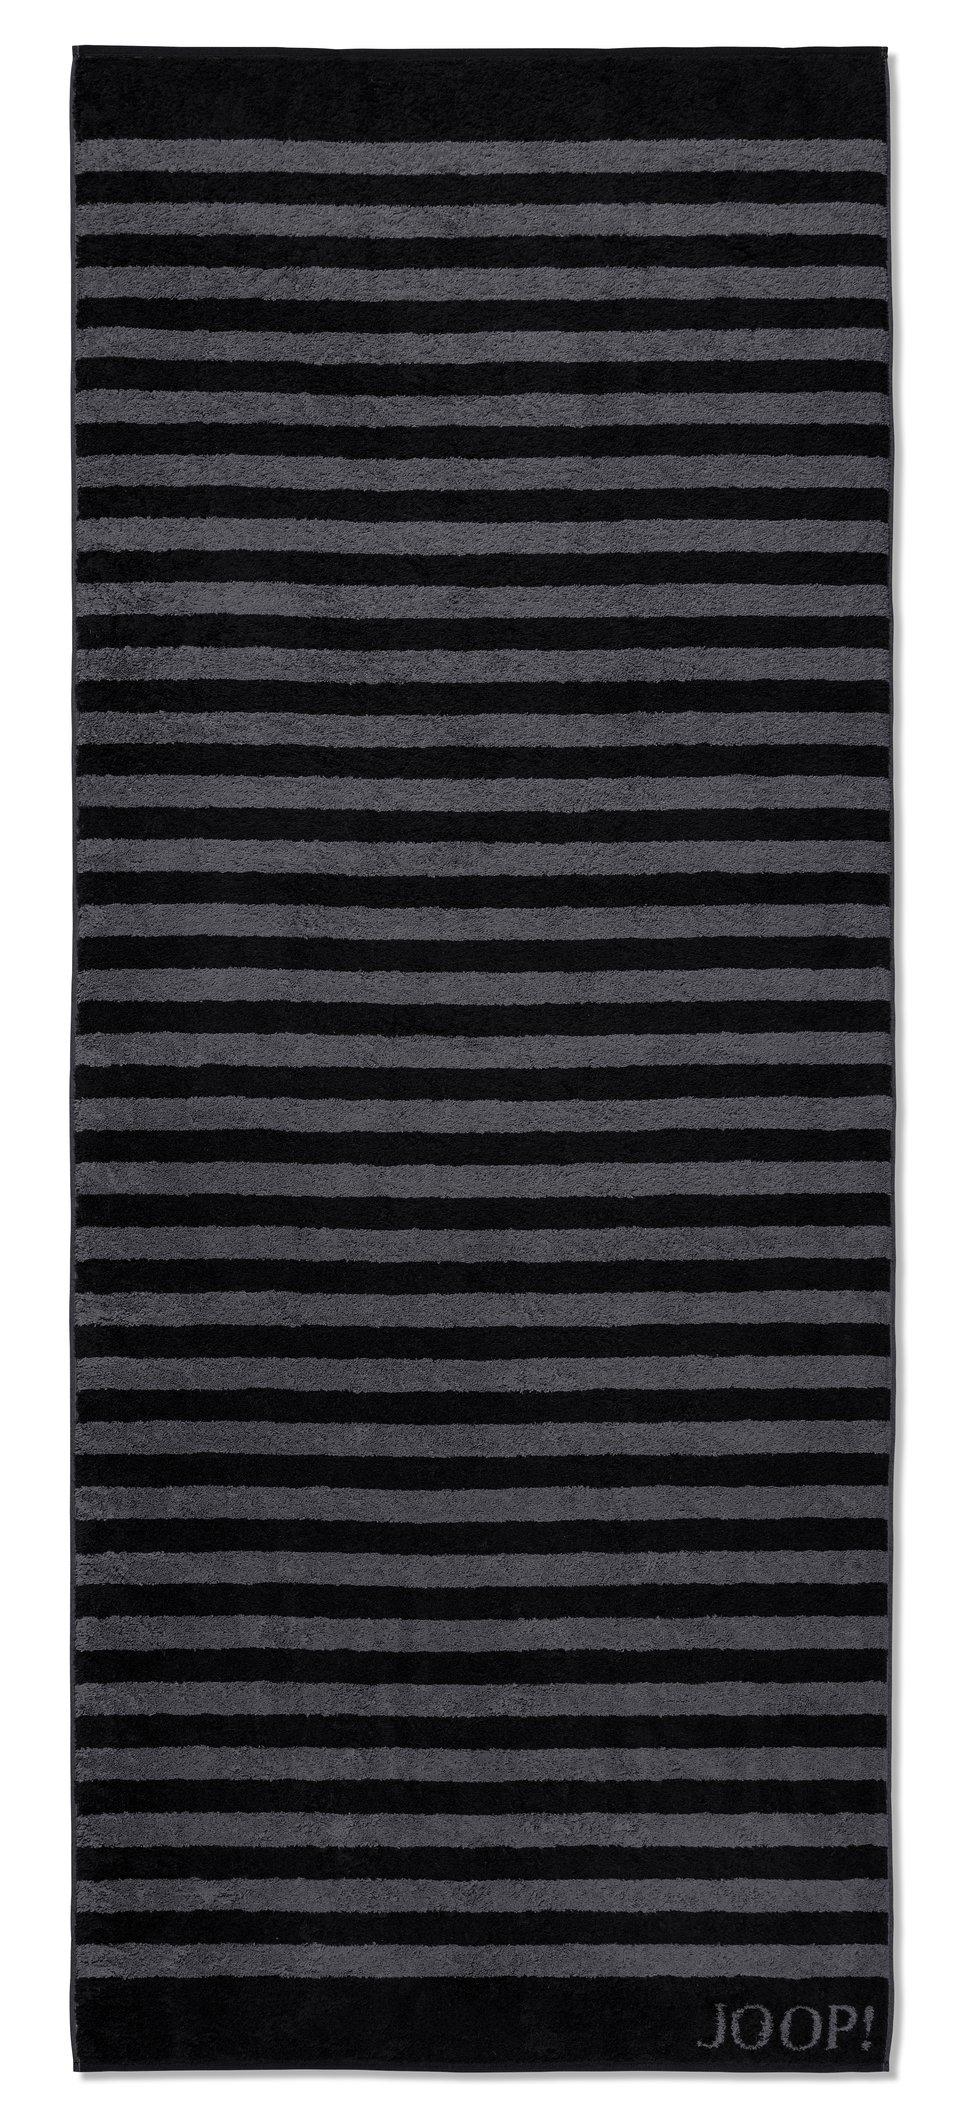 JOOP! Classic Stripes Saunatuch 80x200 cm 1610-90 Schwarz Kollektion 2020